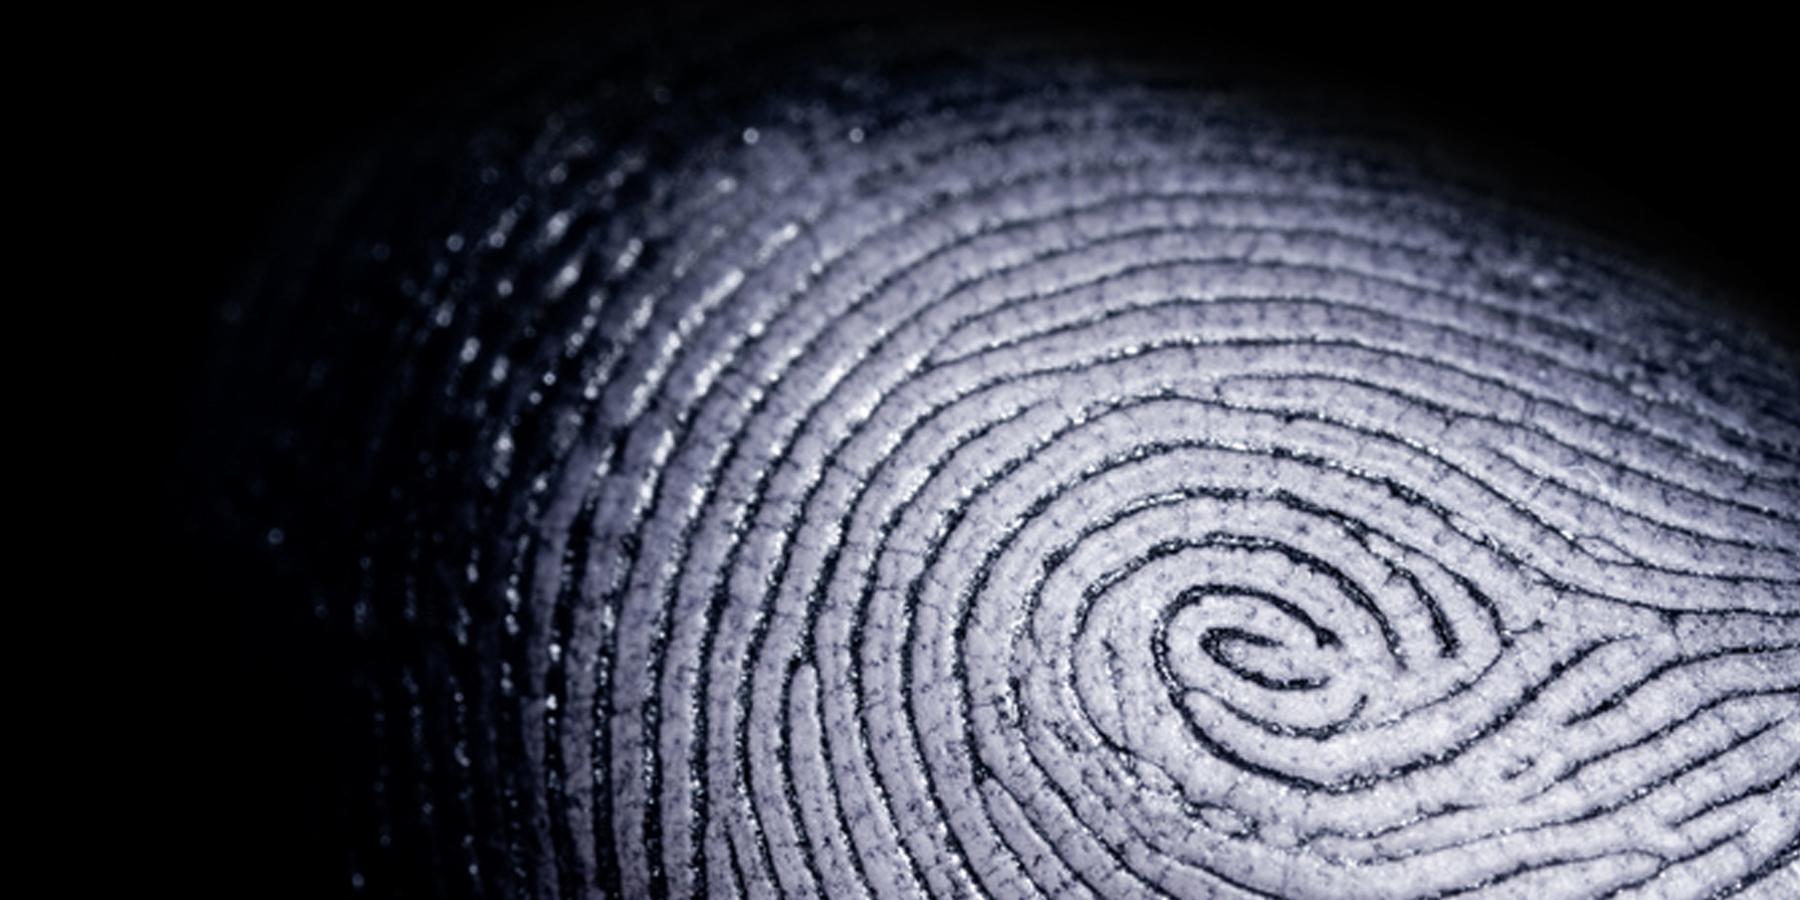 A 'Sandblasting' Technique to Detect Fingerprints